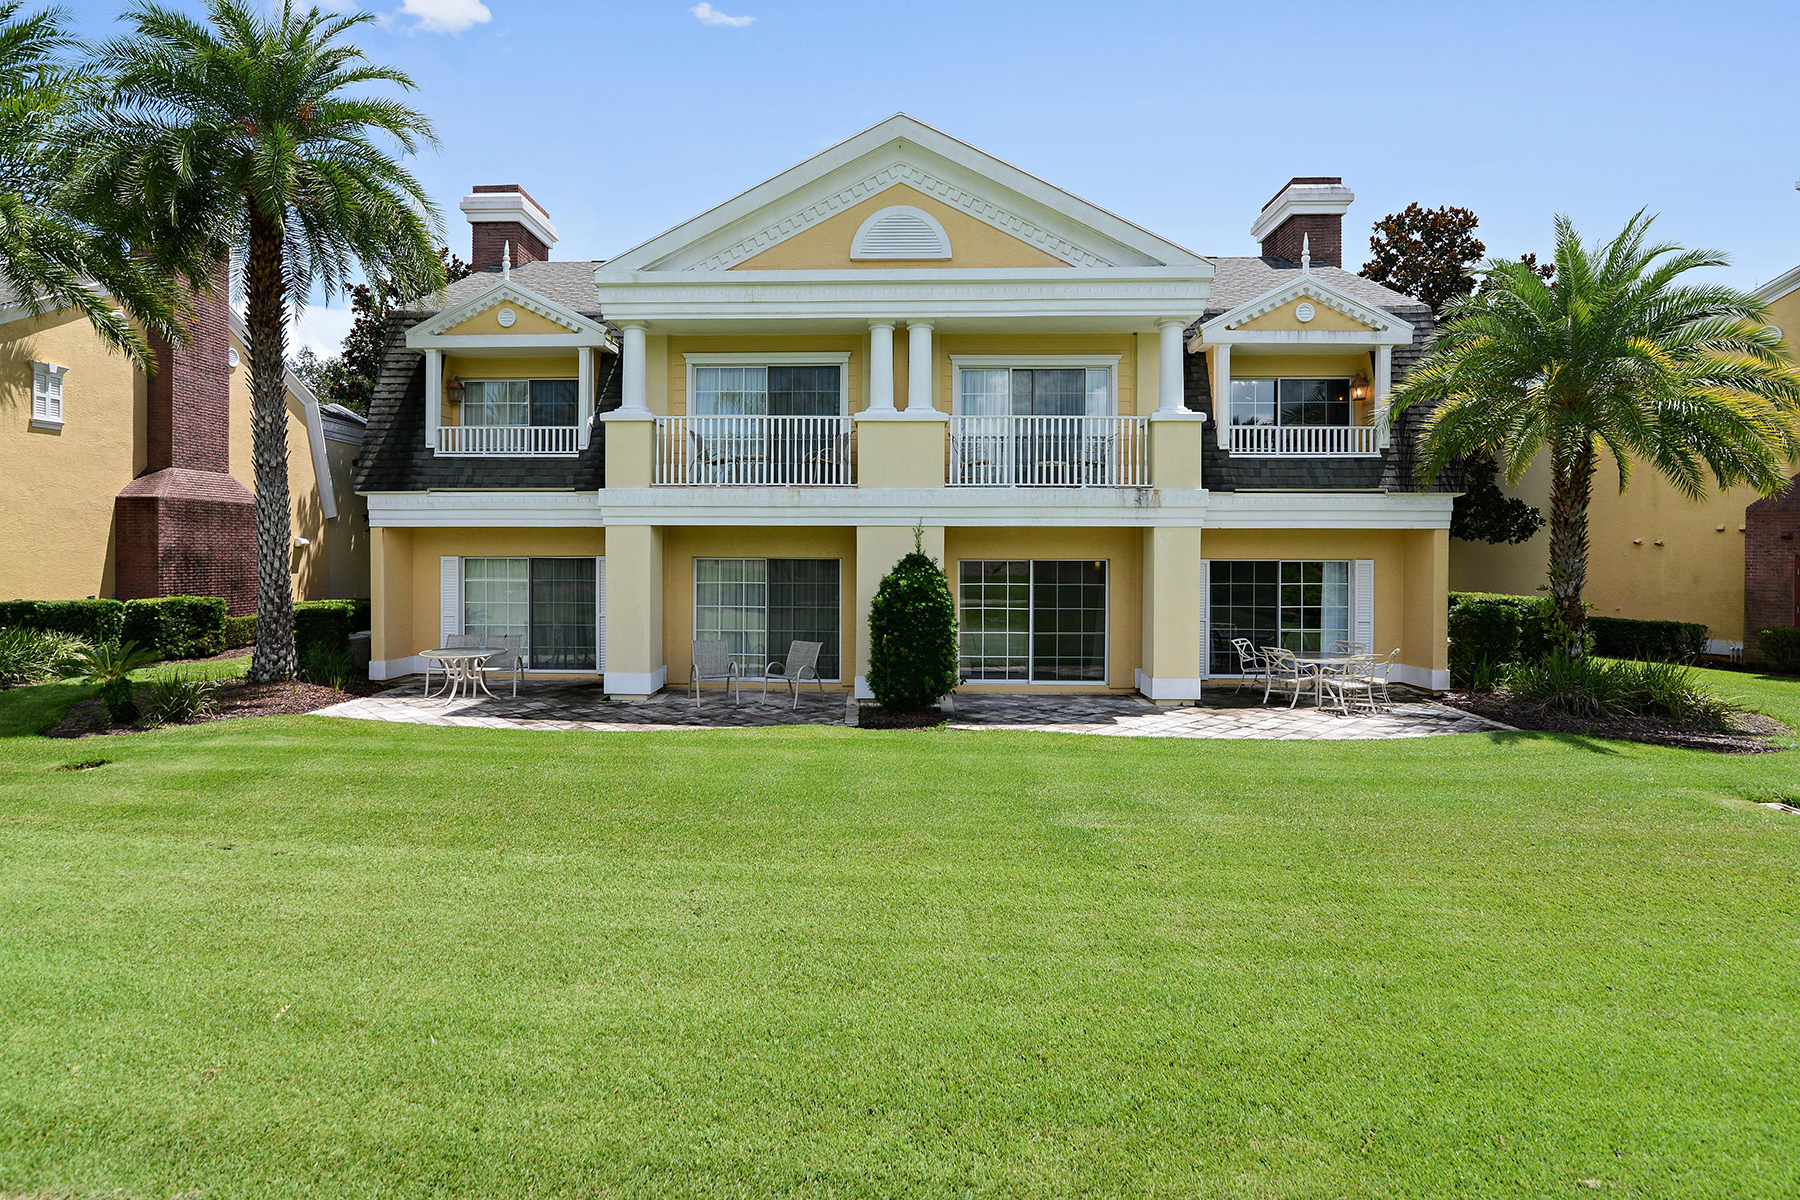 Condominio por un Venta en REUNION 1334 Seven Eagles Ct 141 Reunion, Florida, 34747 Estados Unidos